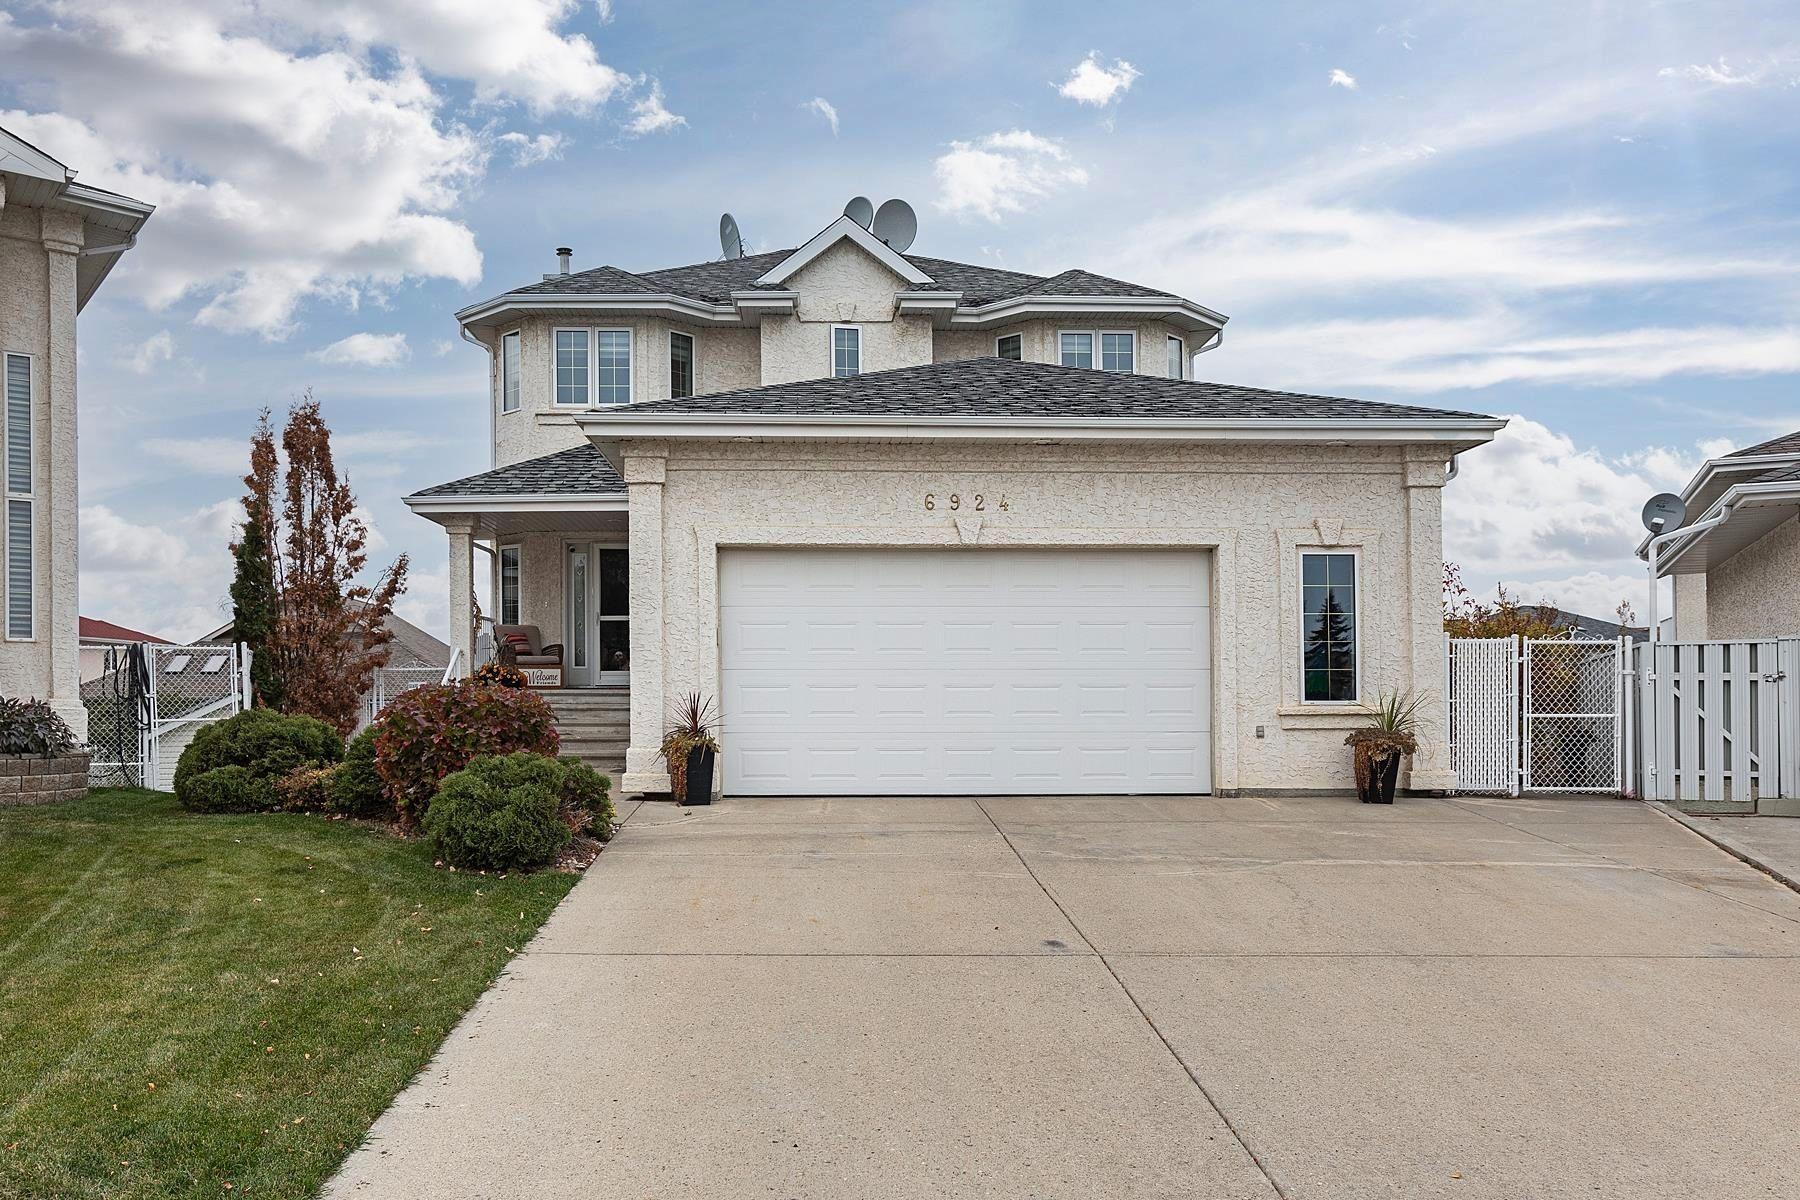 Main Photo: 6924 162 Avenue in Edmonton: Zone 28 House for sale : MLS®# E4266260